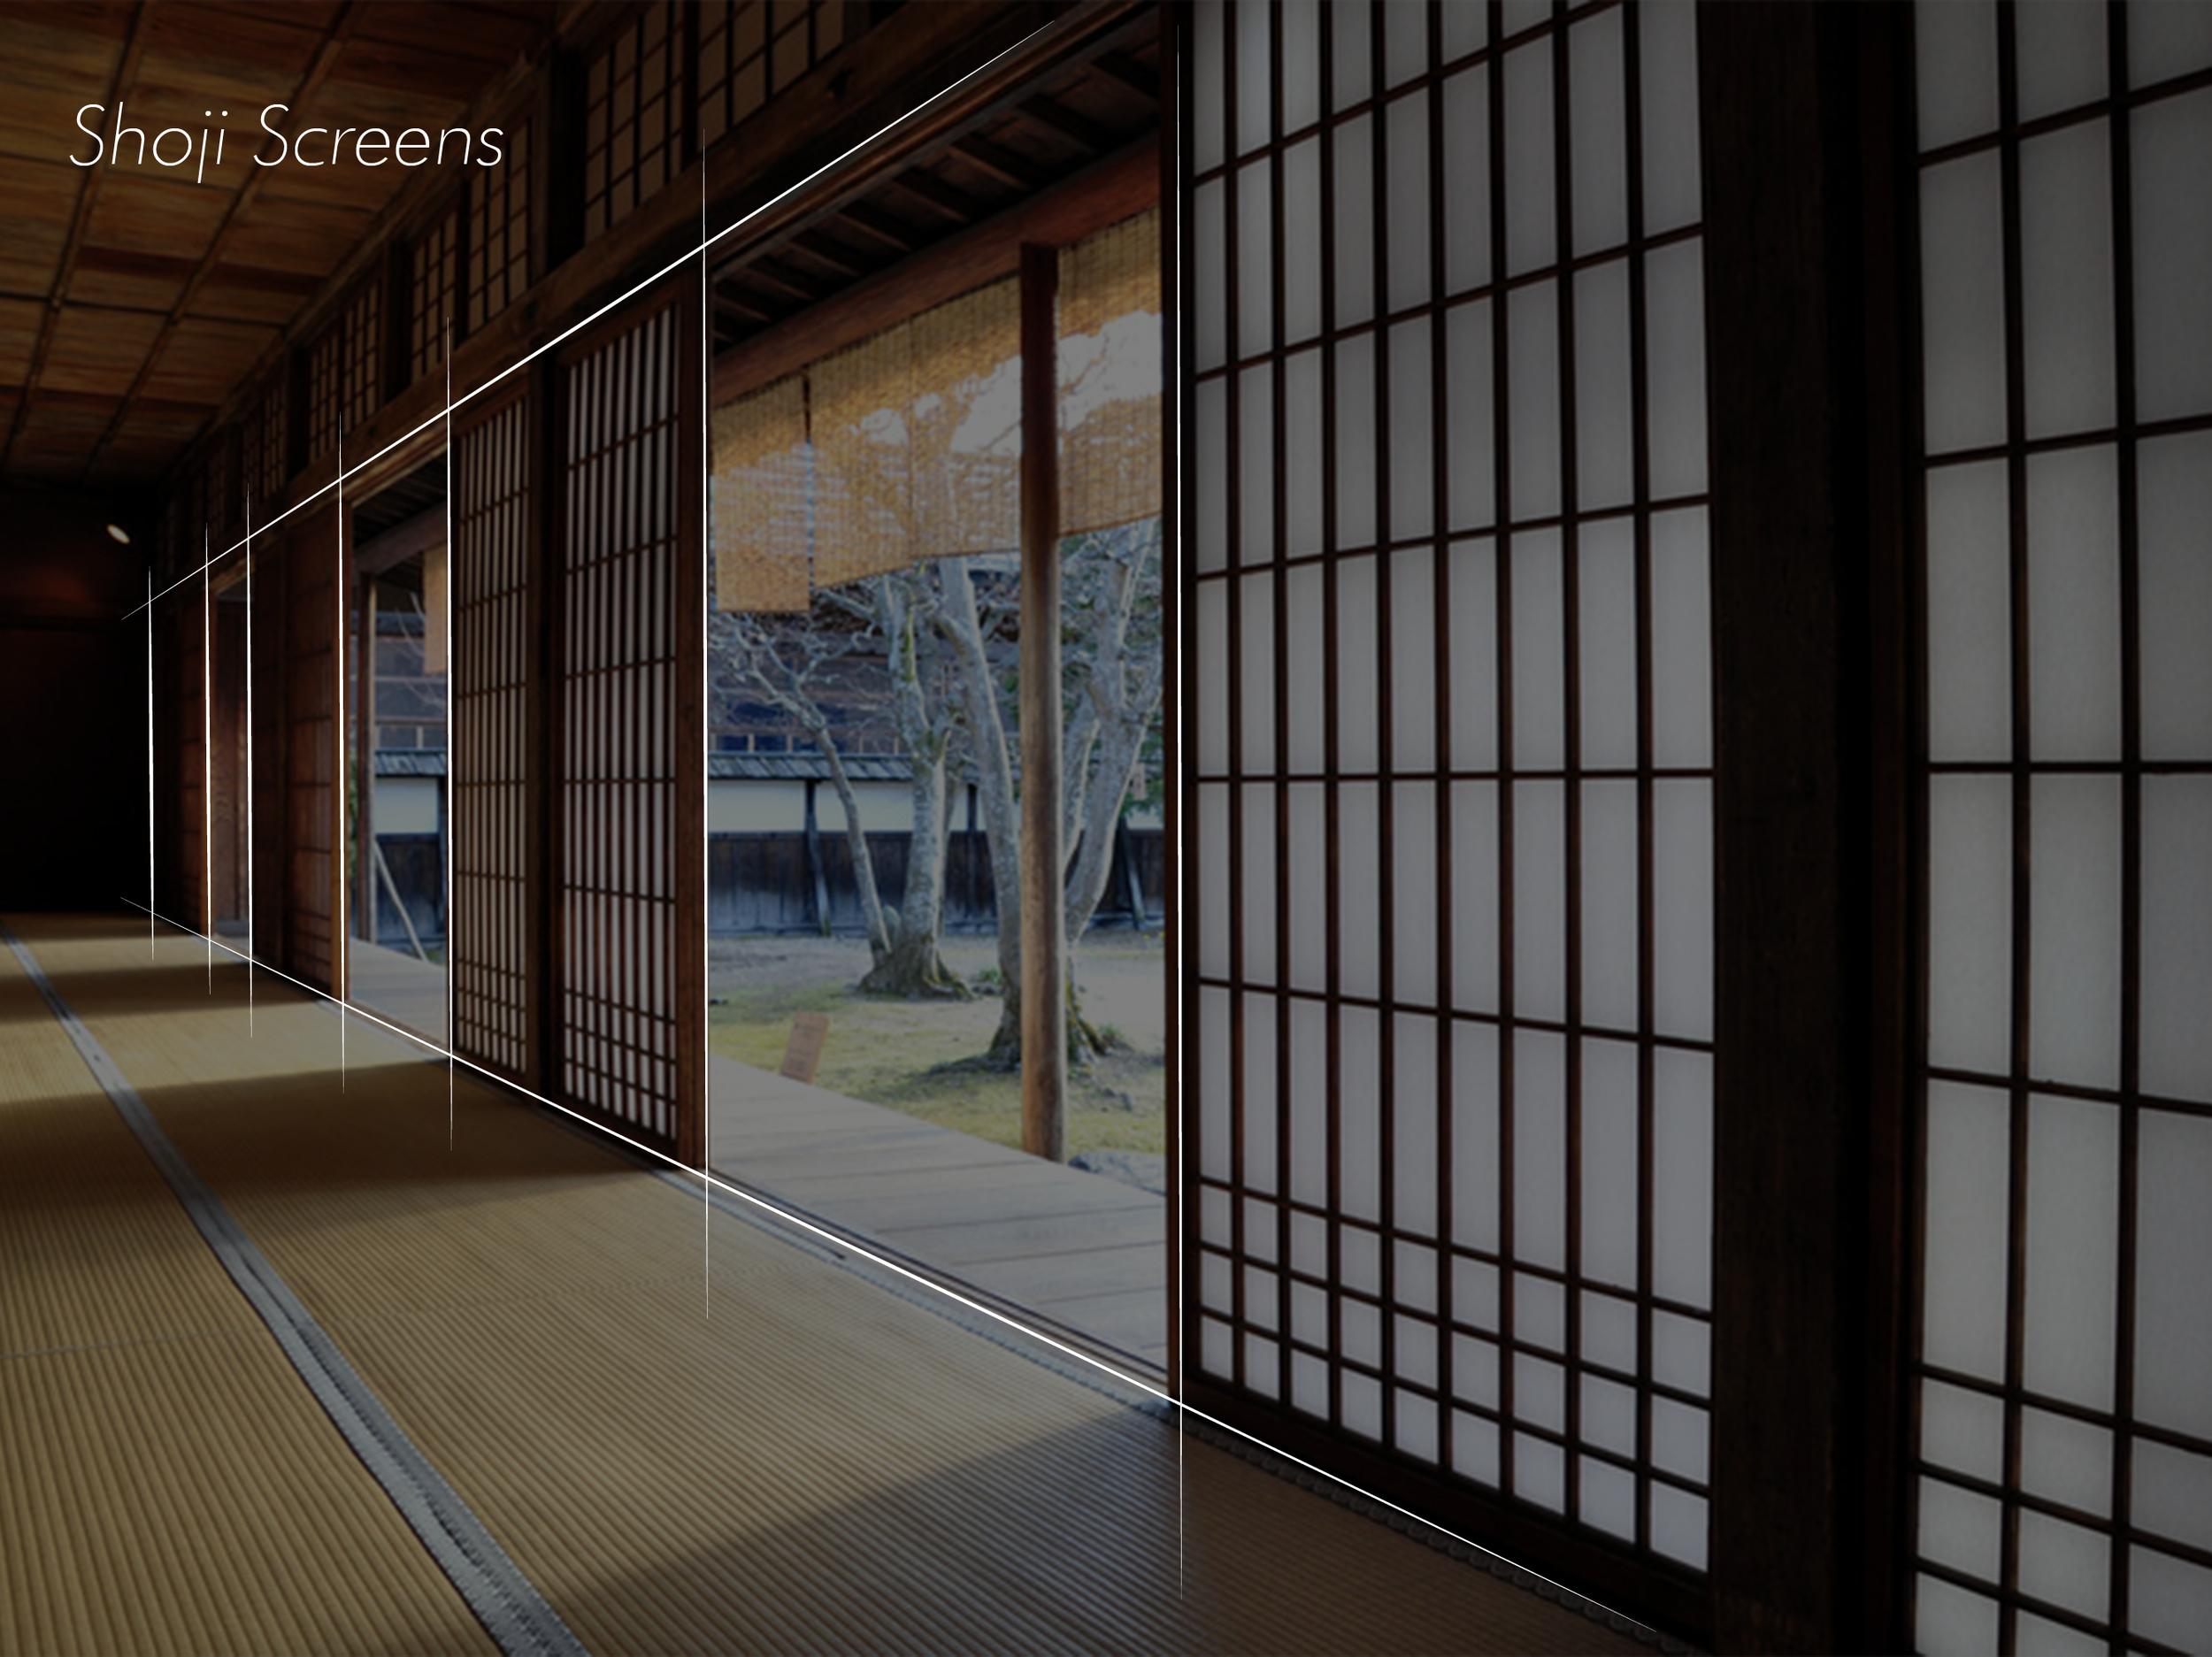 shoji screens in Japanese Aesthetics-01.png